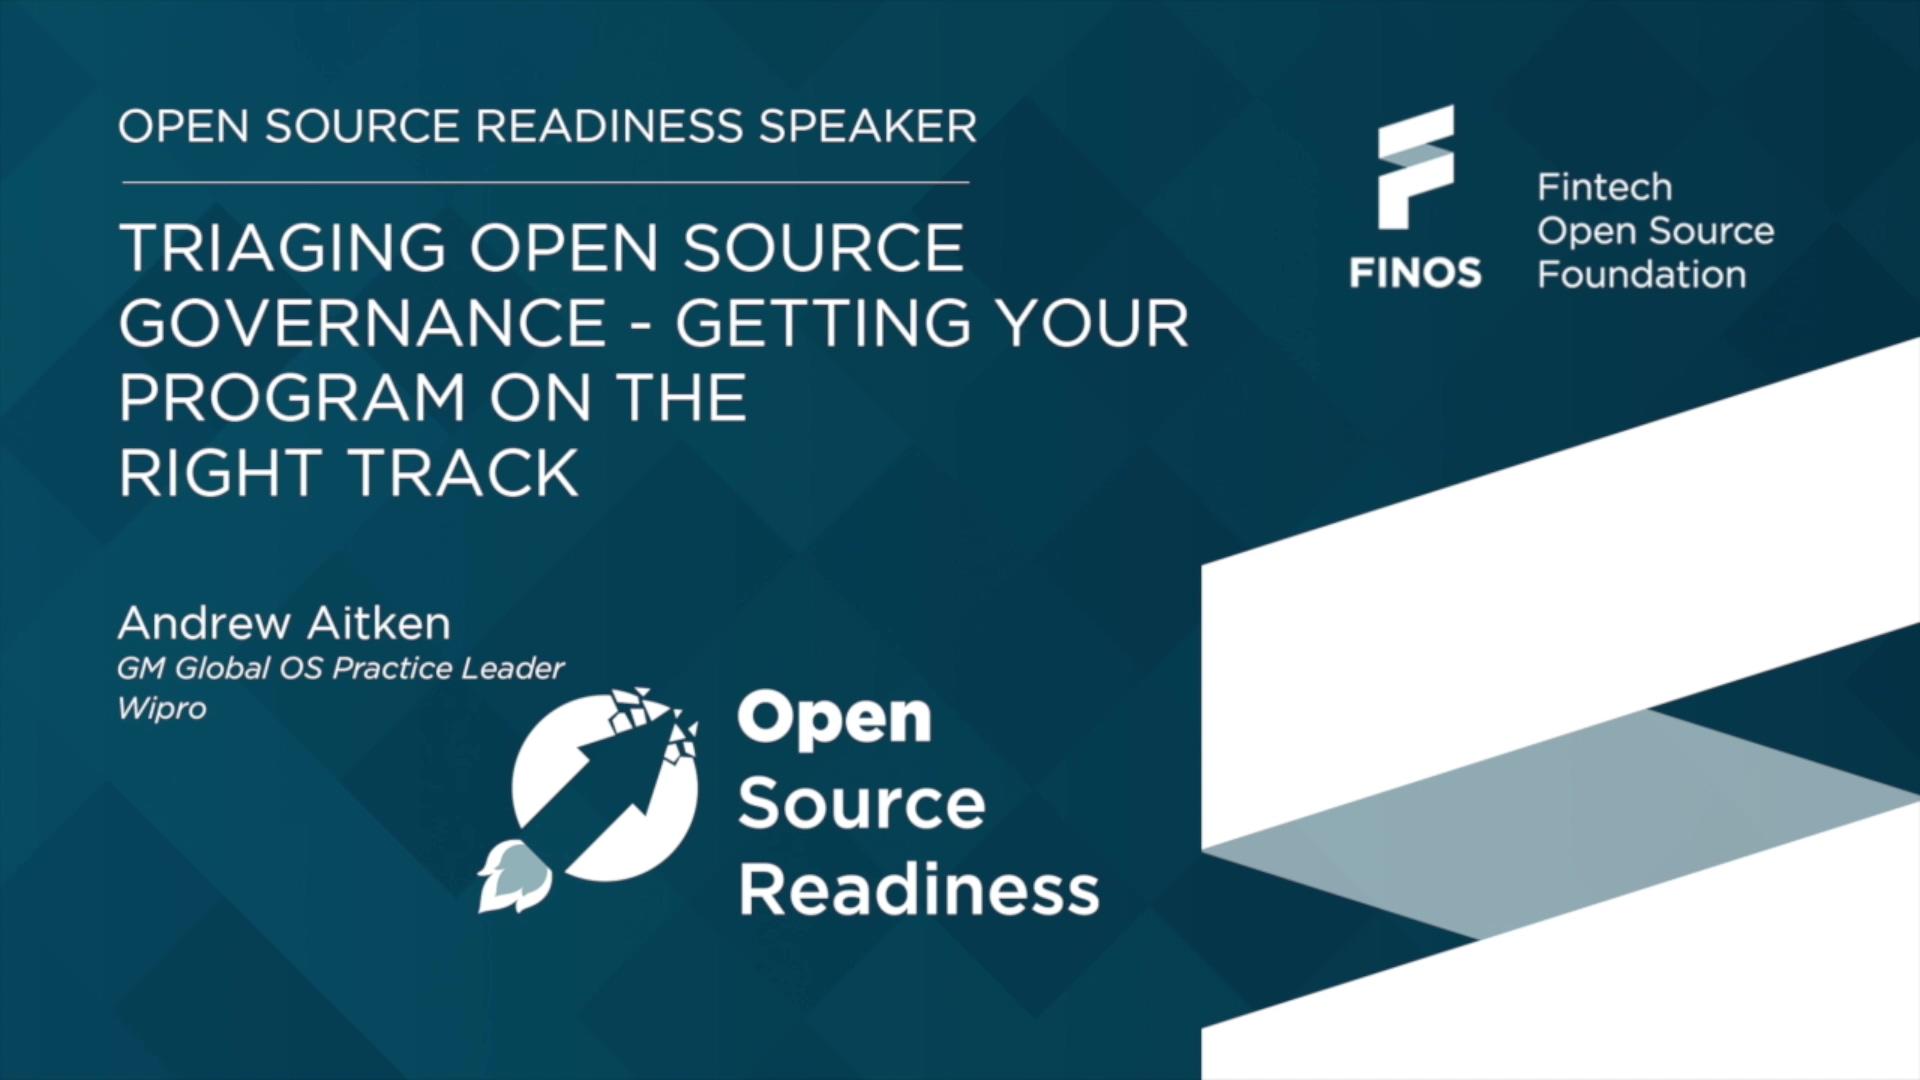 FINOS Open Source Readiness - Andrew Aitken